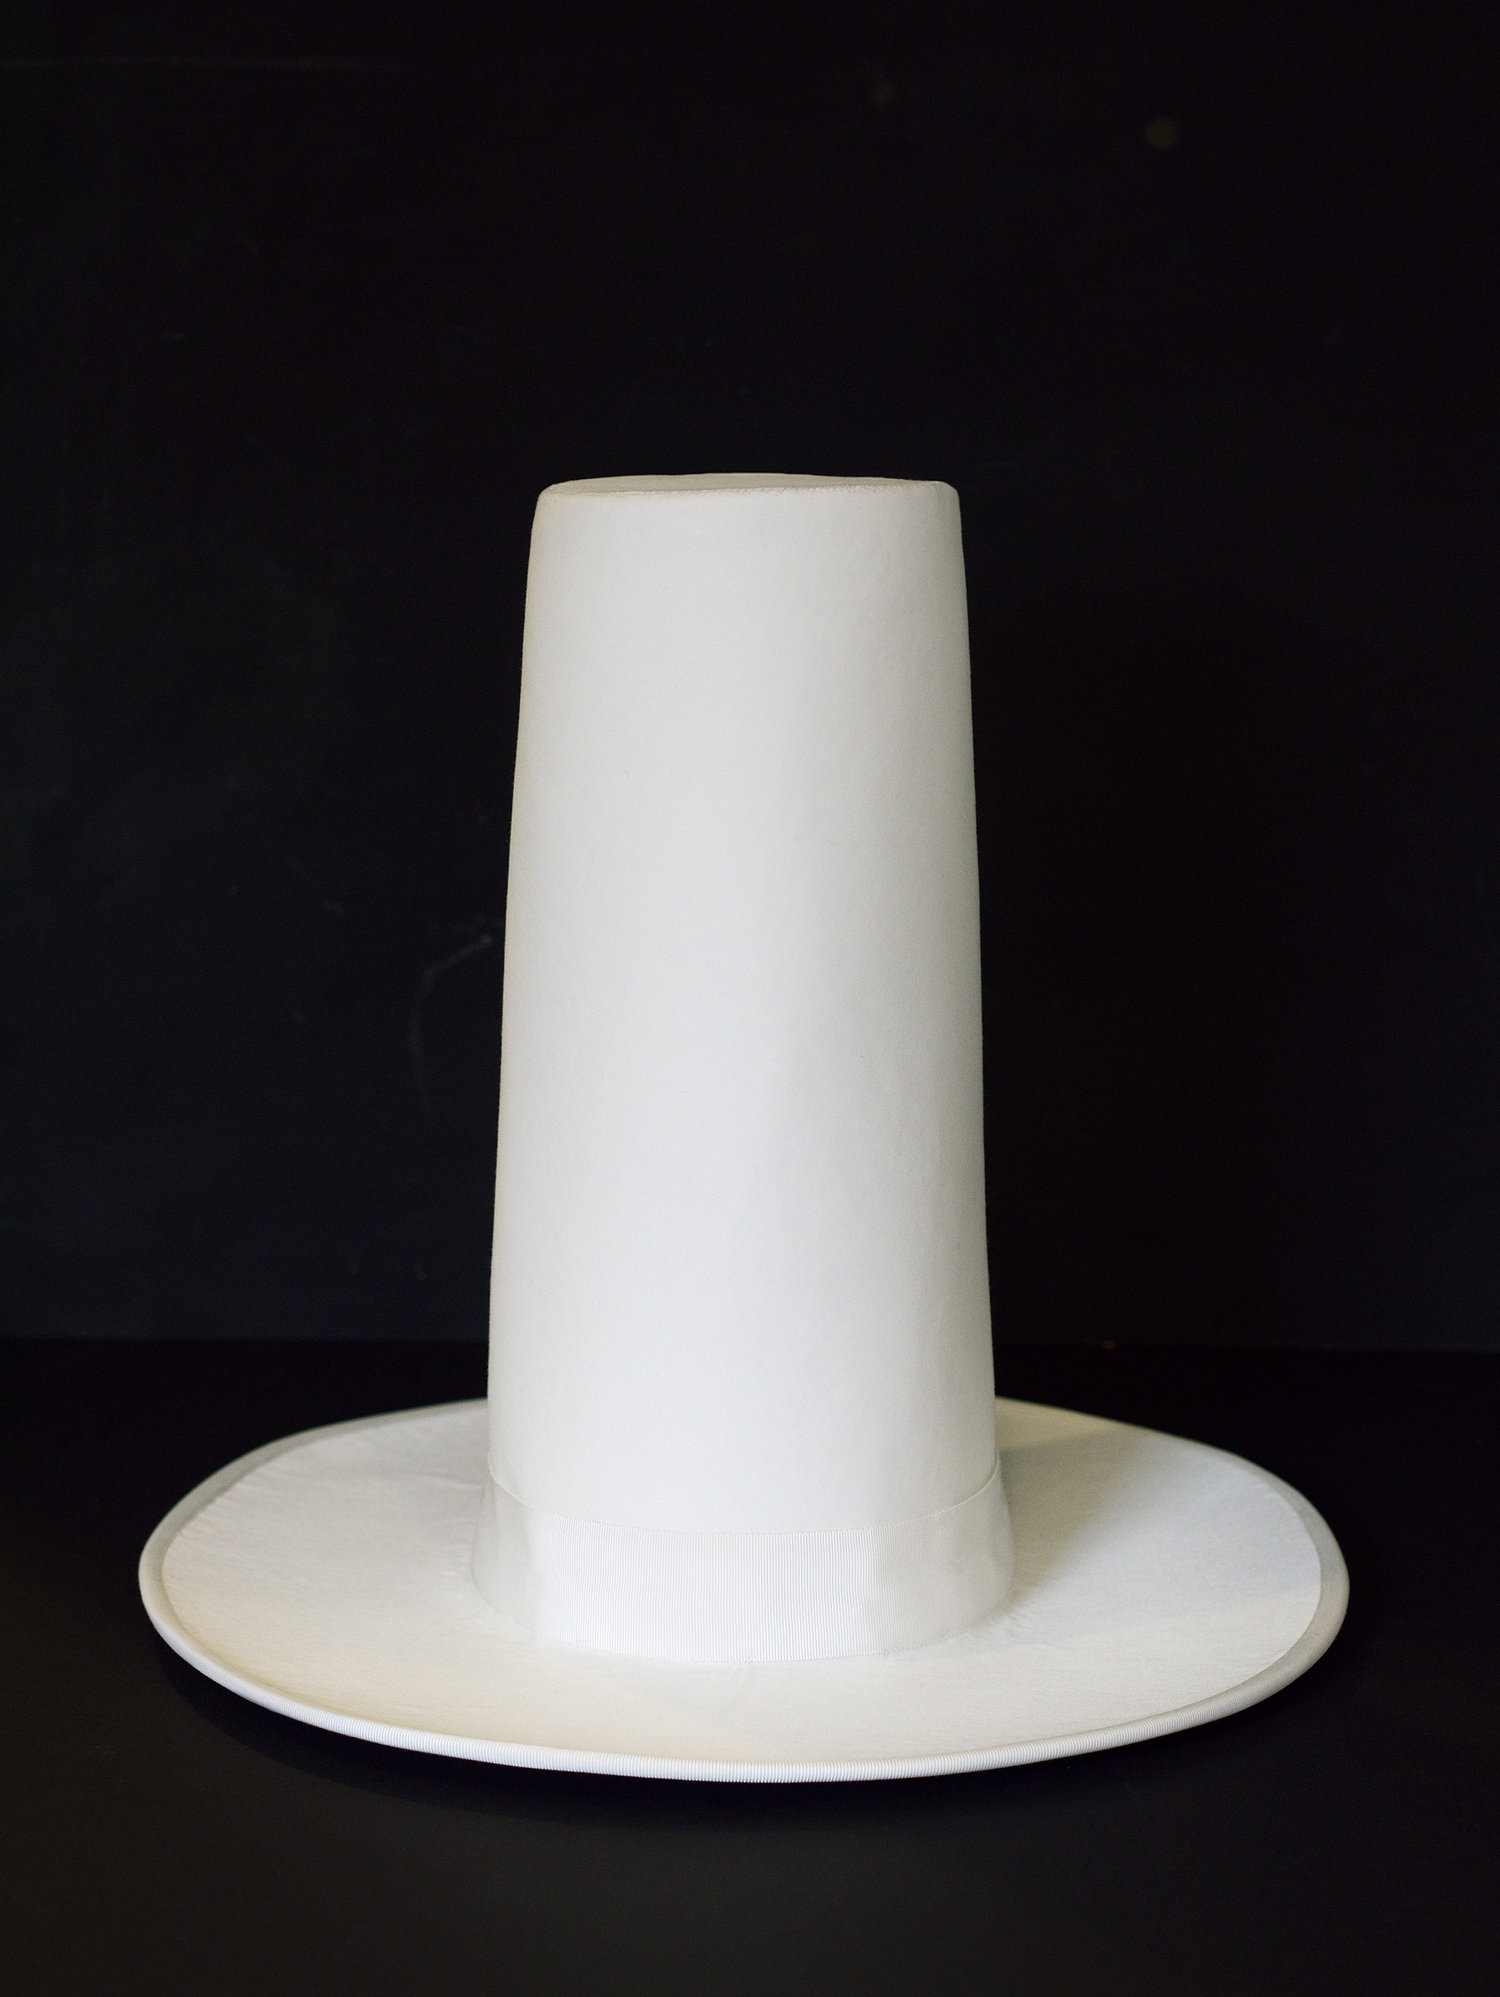 Hatt, sculpture, 2012, h 35 cm (made by hat maker Sara Wikholm/Hats&Art by Sane Hatter)